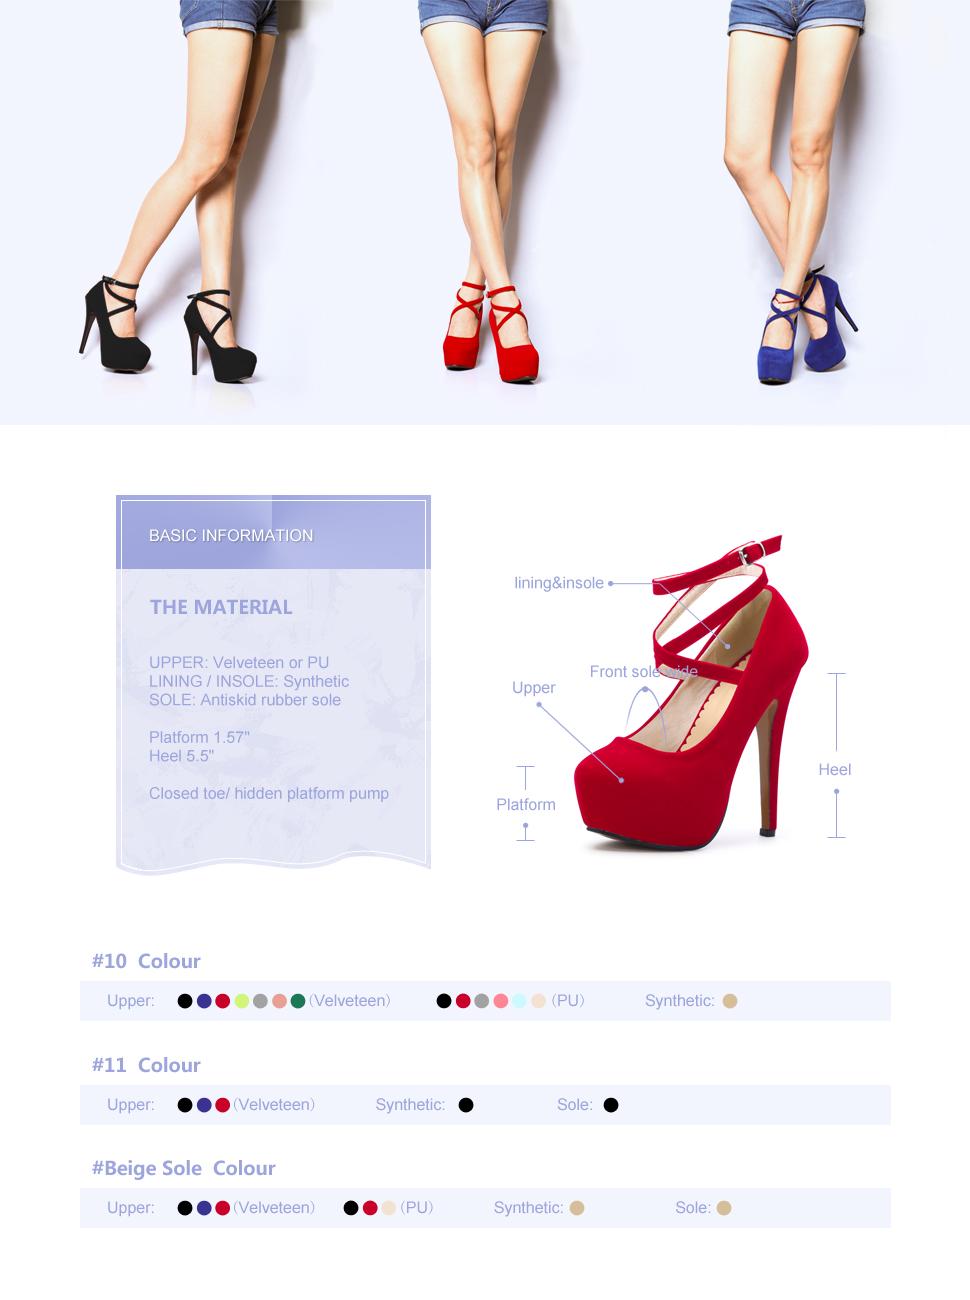 b1e6f4e7e95e OCHENTA Femme Escarpins Bride Cheville Talon Aiguille Plateforme Epais  Fermeture Lacets Chaussures Club Soiree